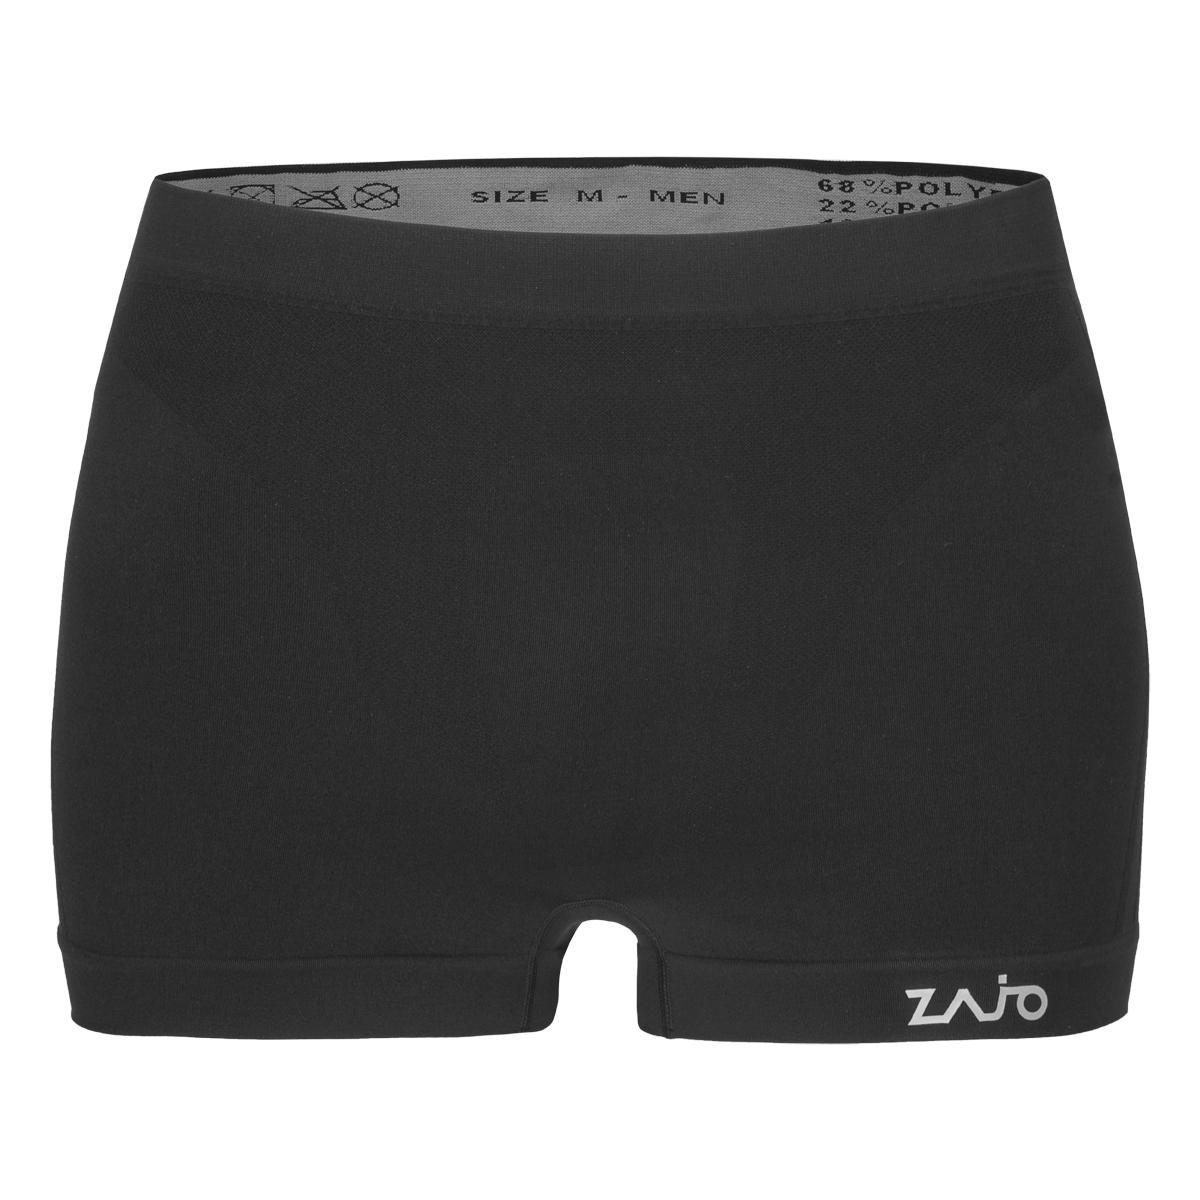 ZAJO - Contour M Boxer Shorts Black 2